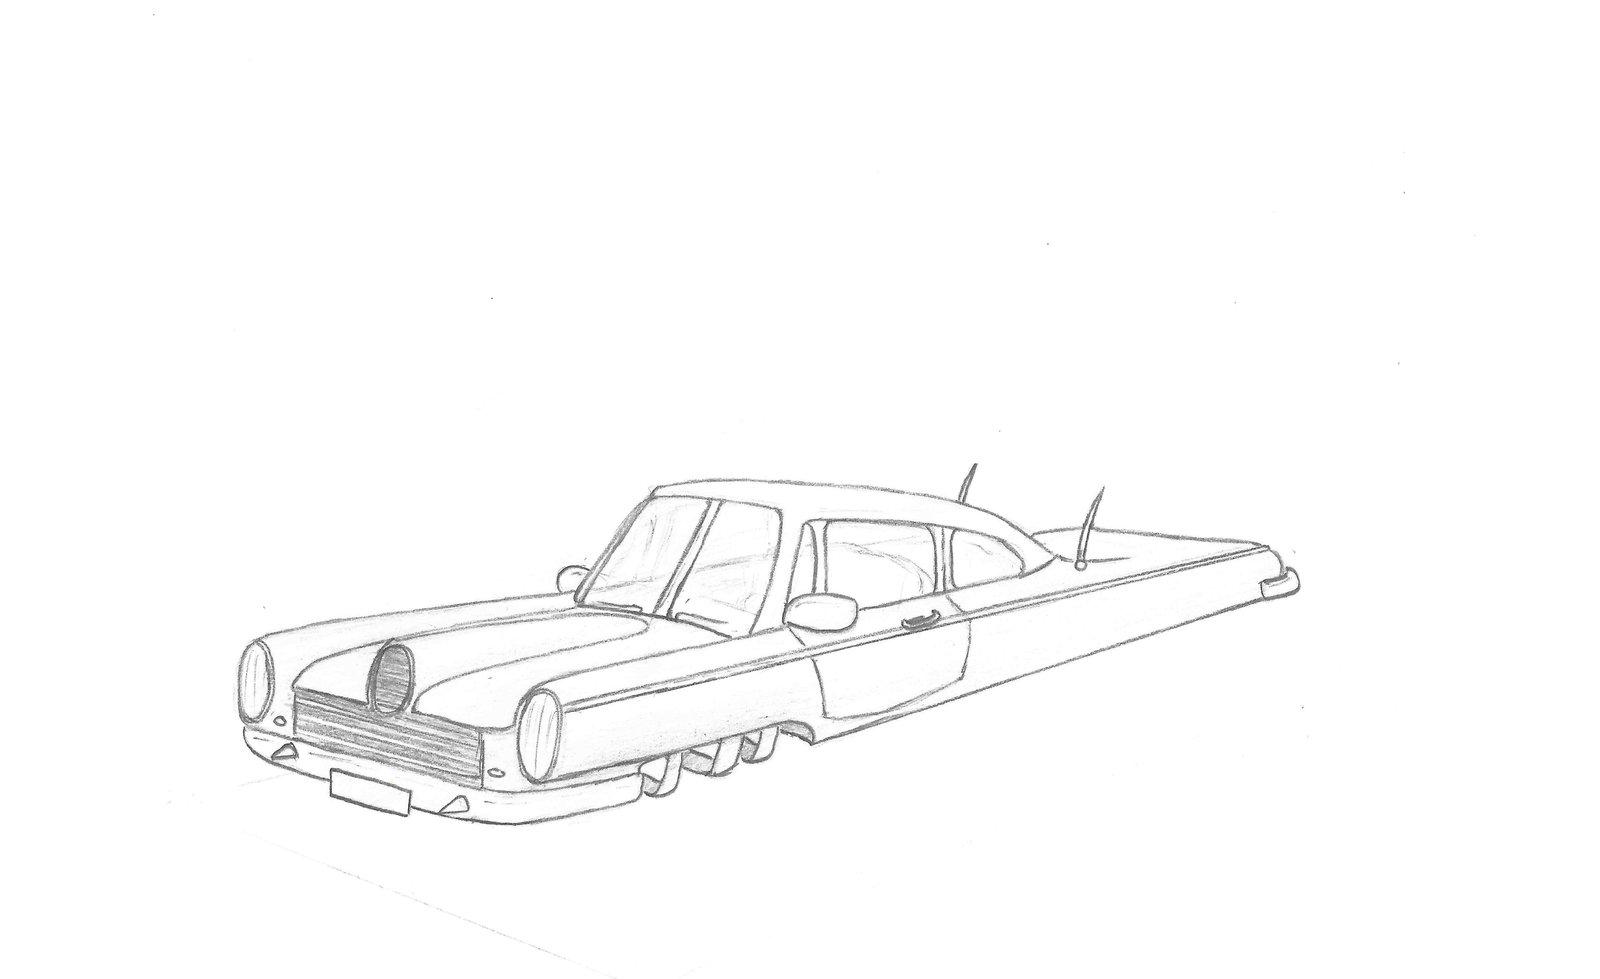 Drawn airplane car #5